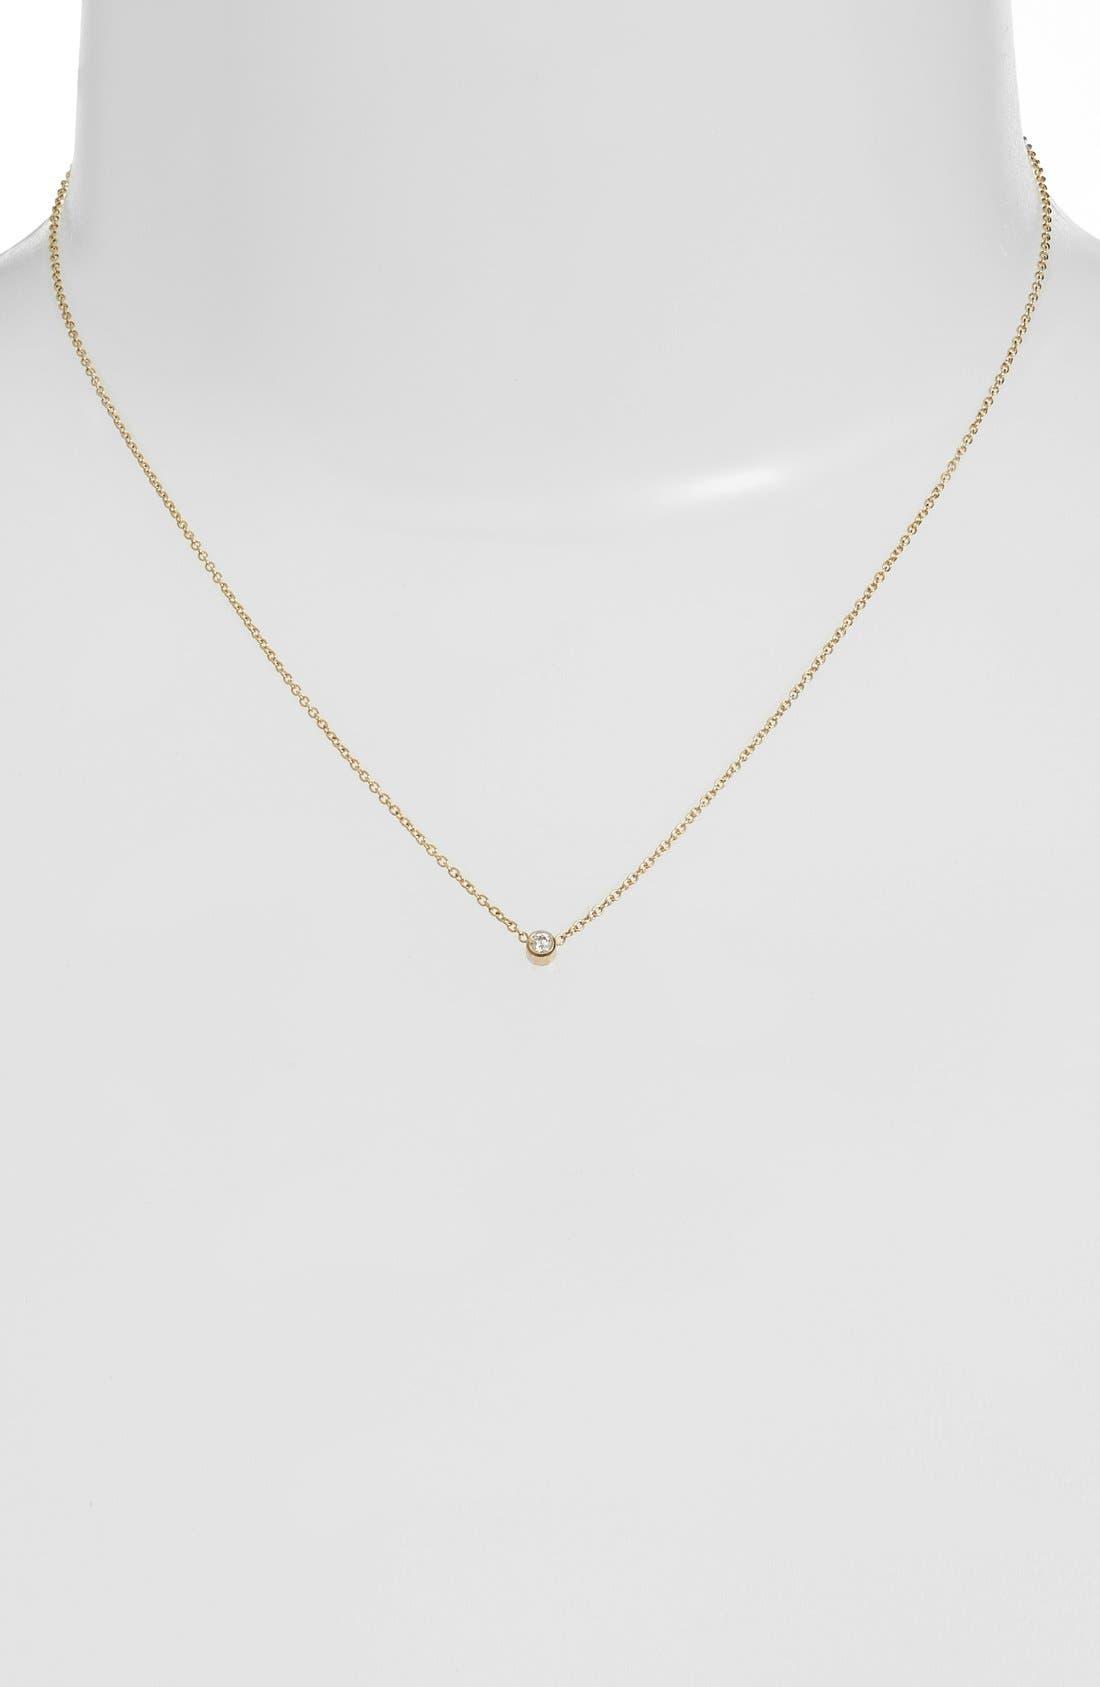 Diamond Bezel Pendant Necklace,                             Alternate thumbnail 6, color,                             YELLOW GOLD